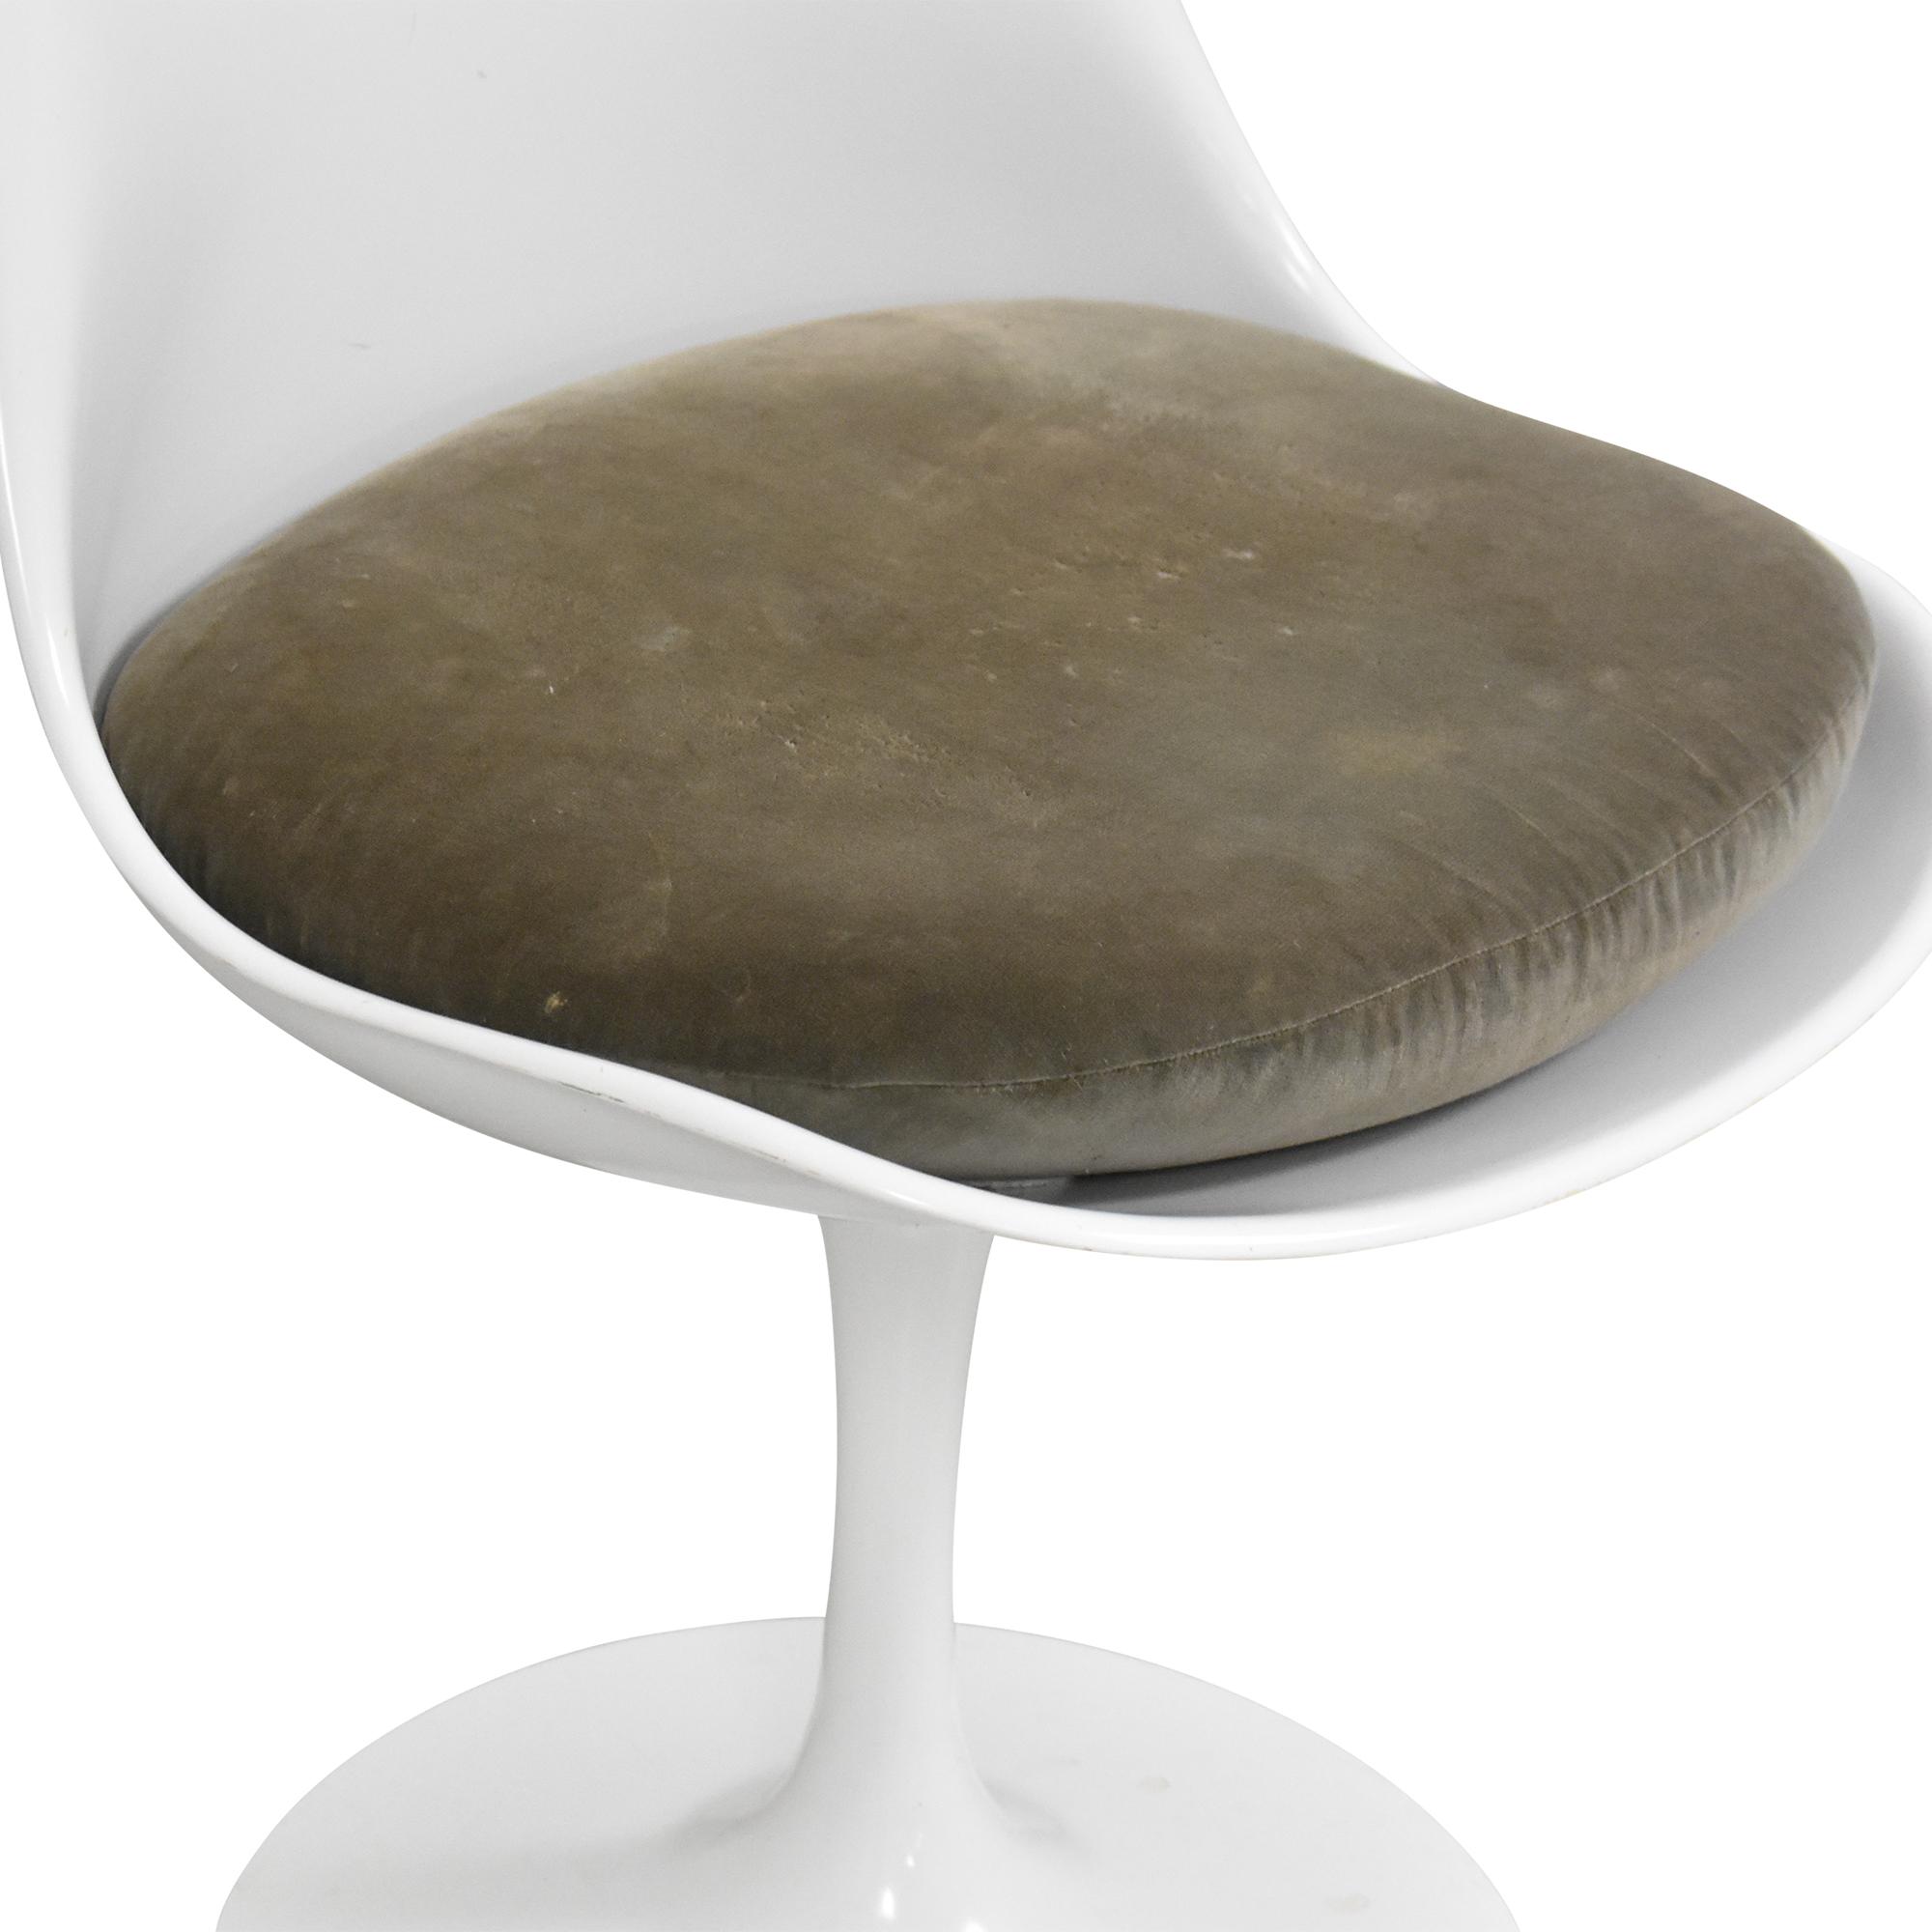 buy Design Within Reach Saarinen Tulip Side Chair Design Within Reach Chairs